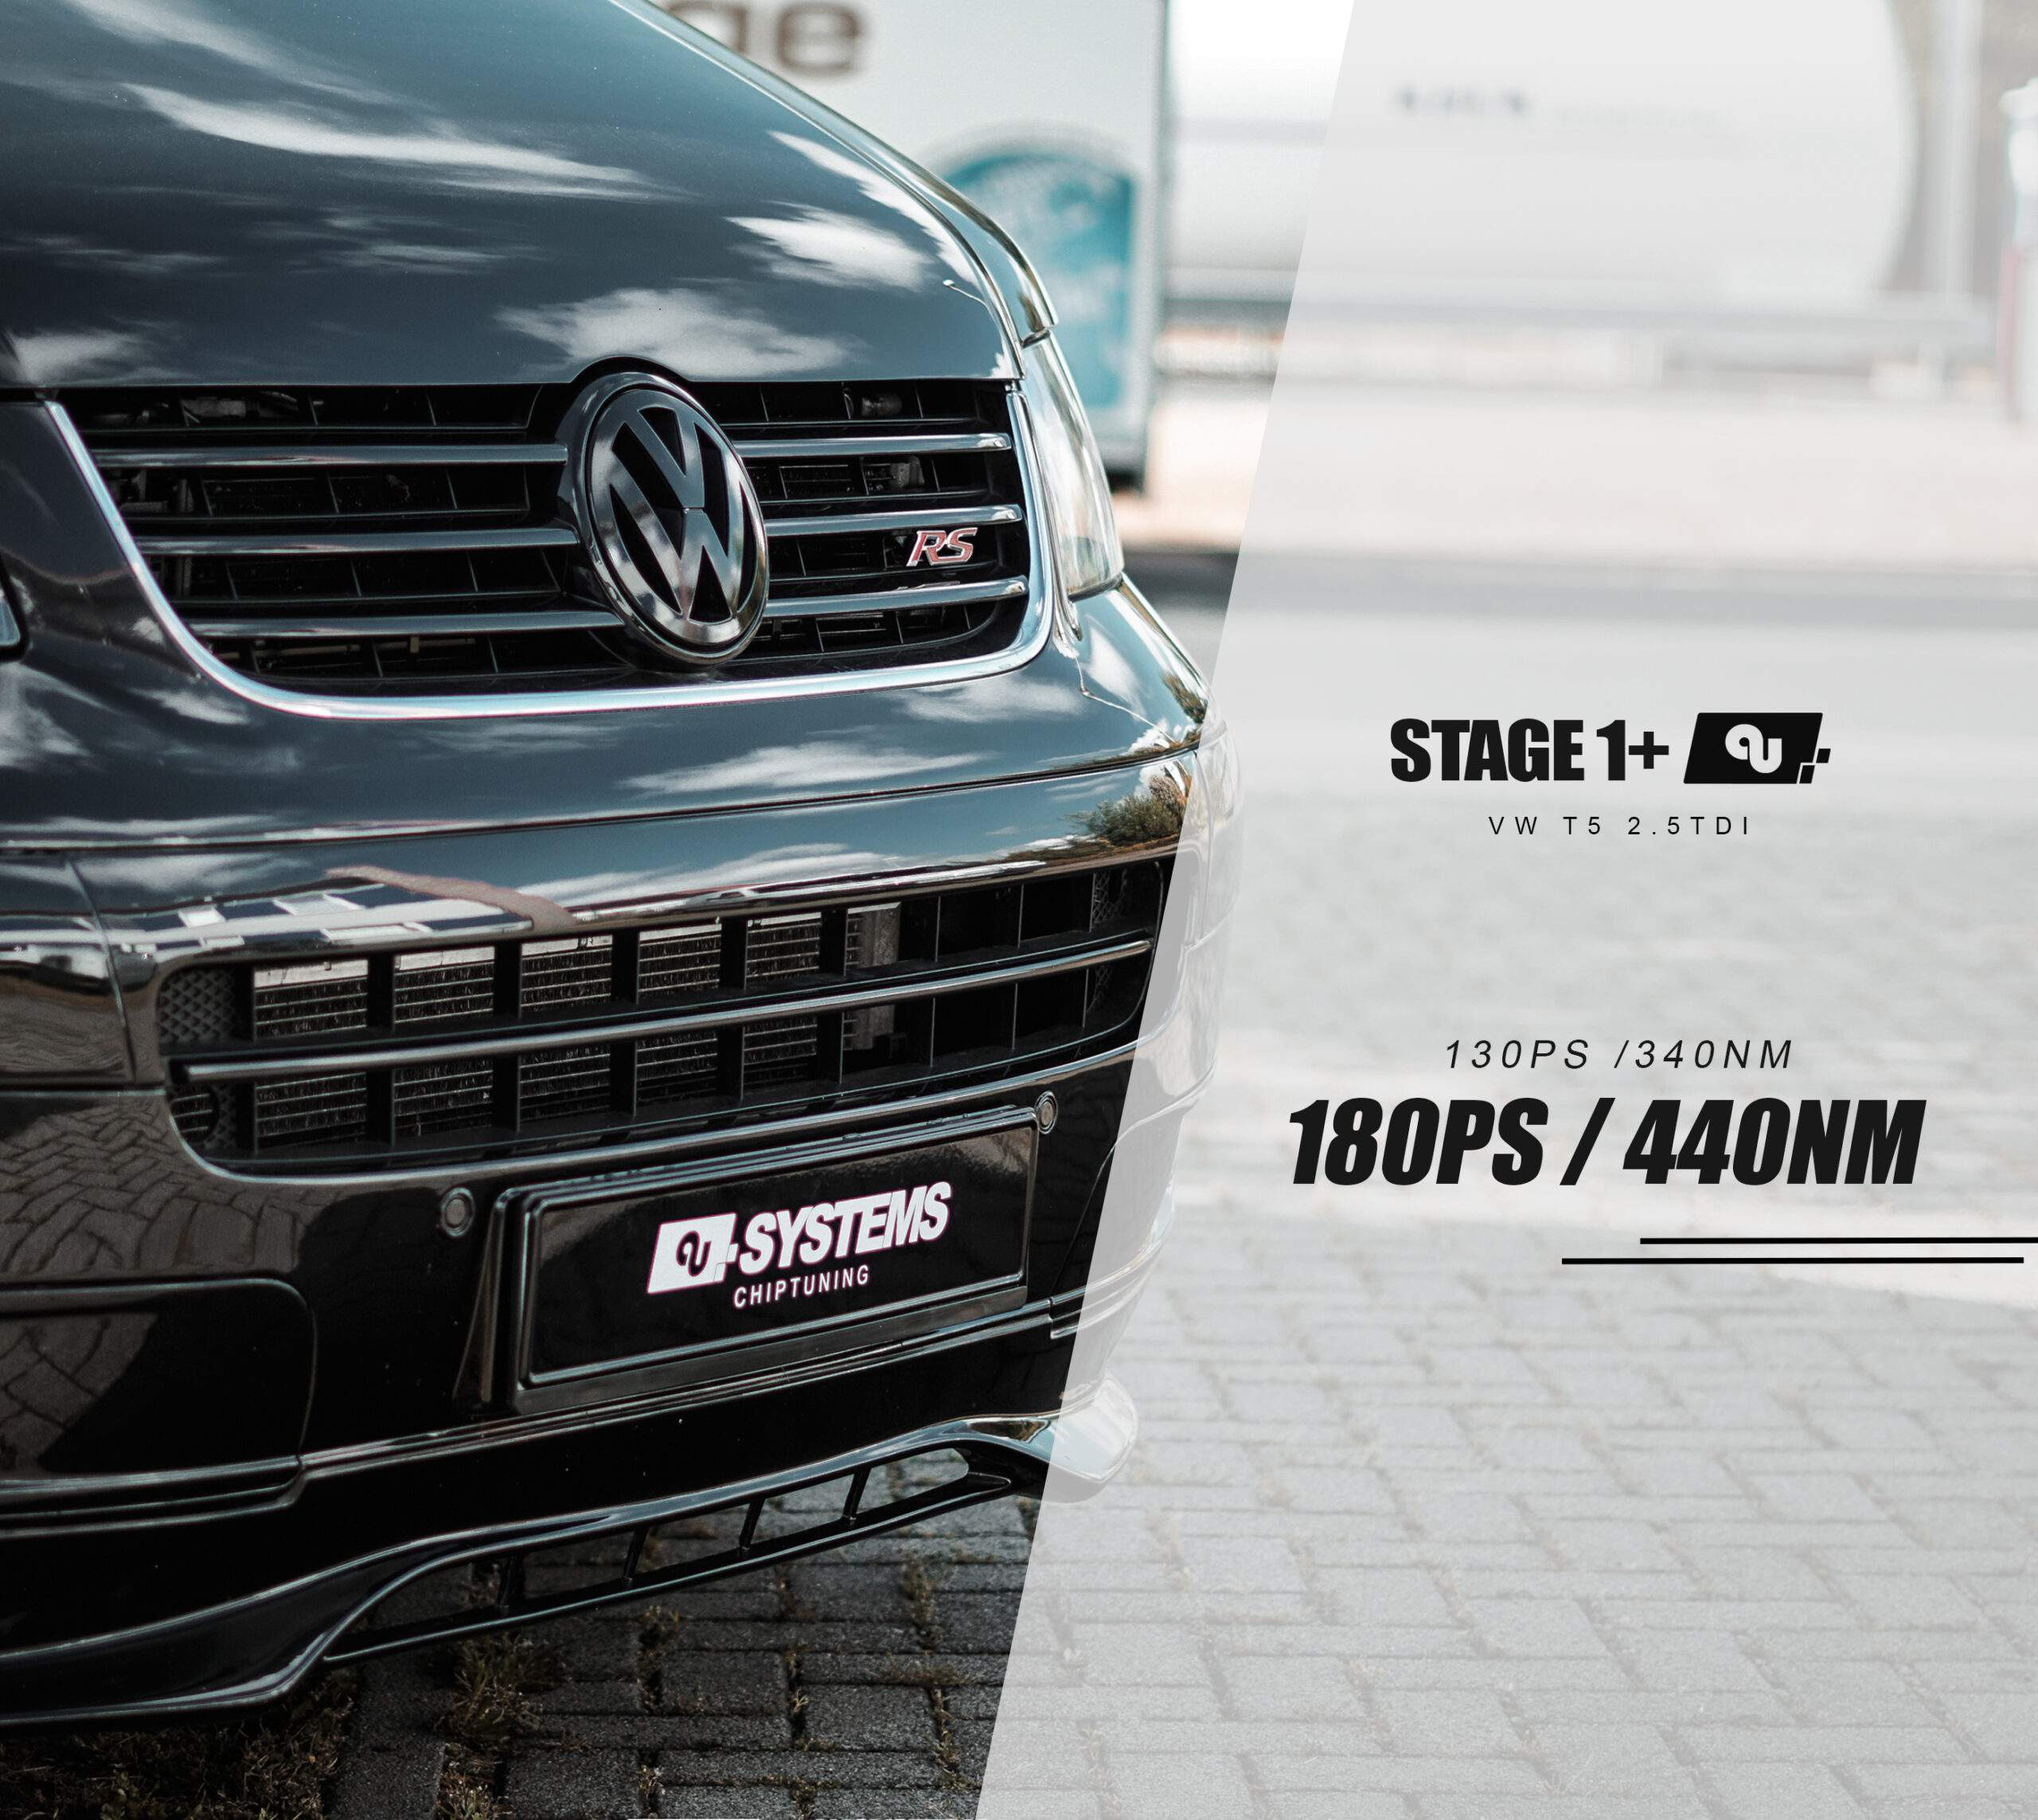 Stage 1+ Optimierung VW T5 2.5TDI